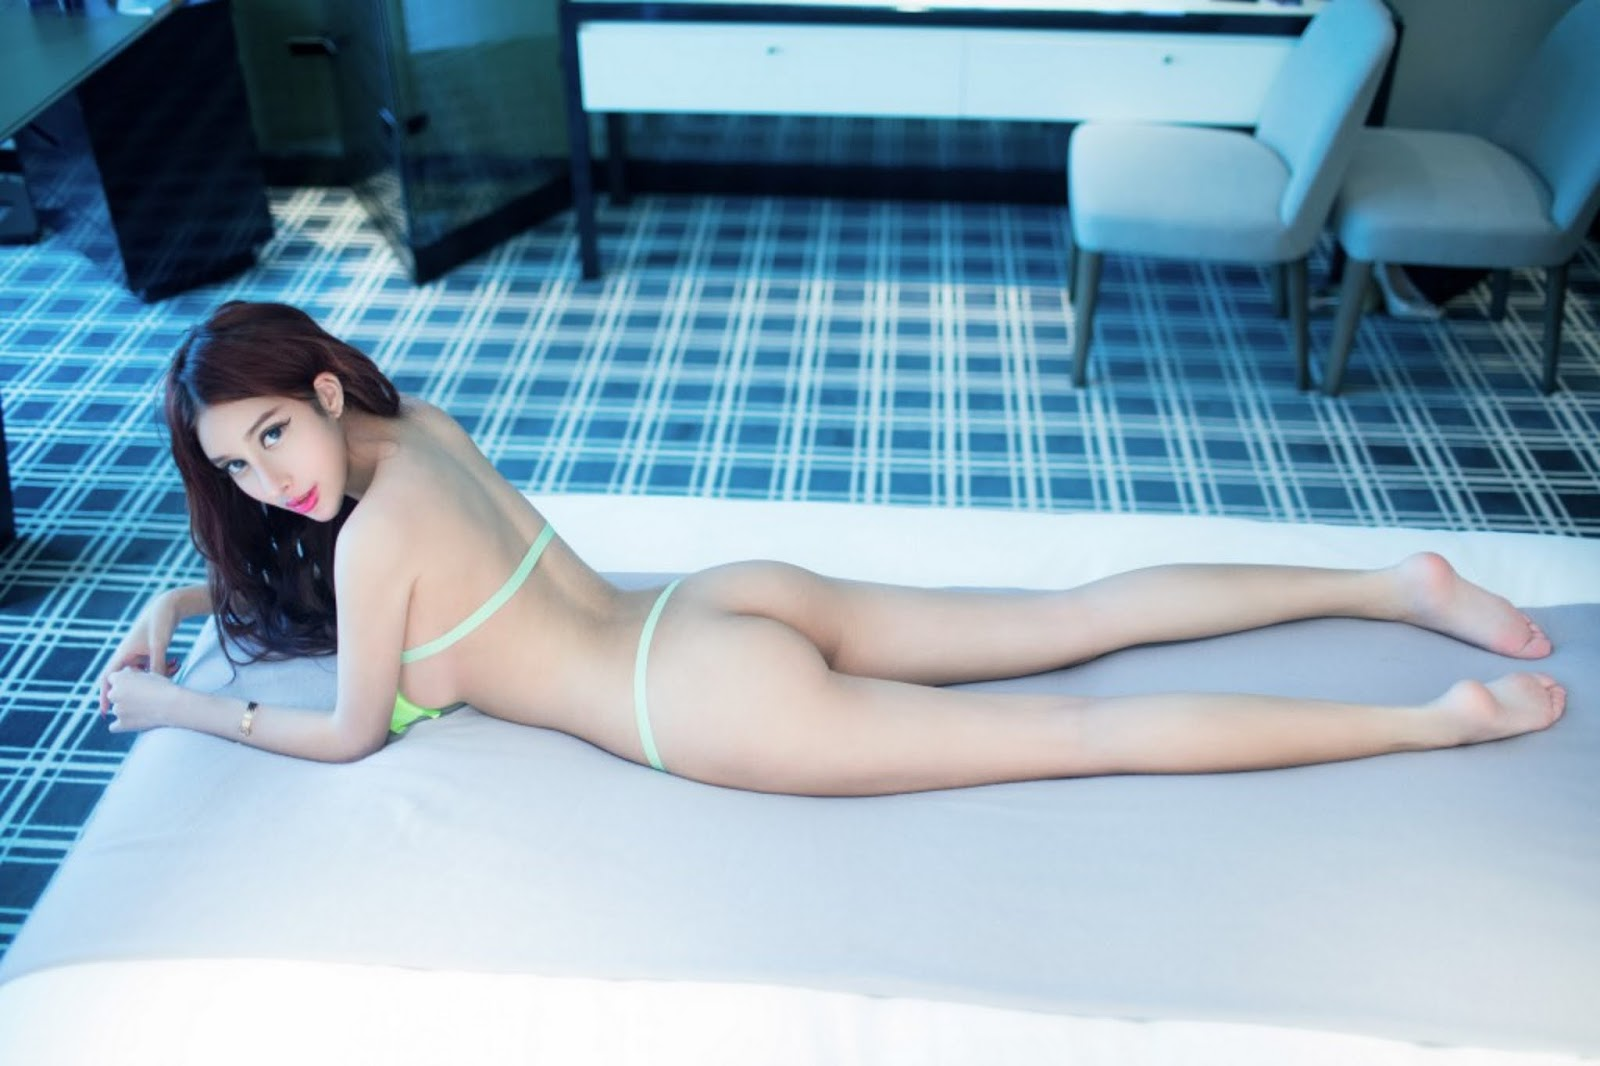 %25C2%25B1 %25C2%25B1 34 - Model Nude TUIGIRL NO.49 Beauty Body Tits